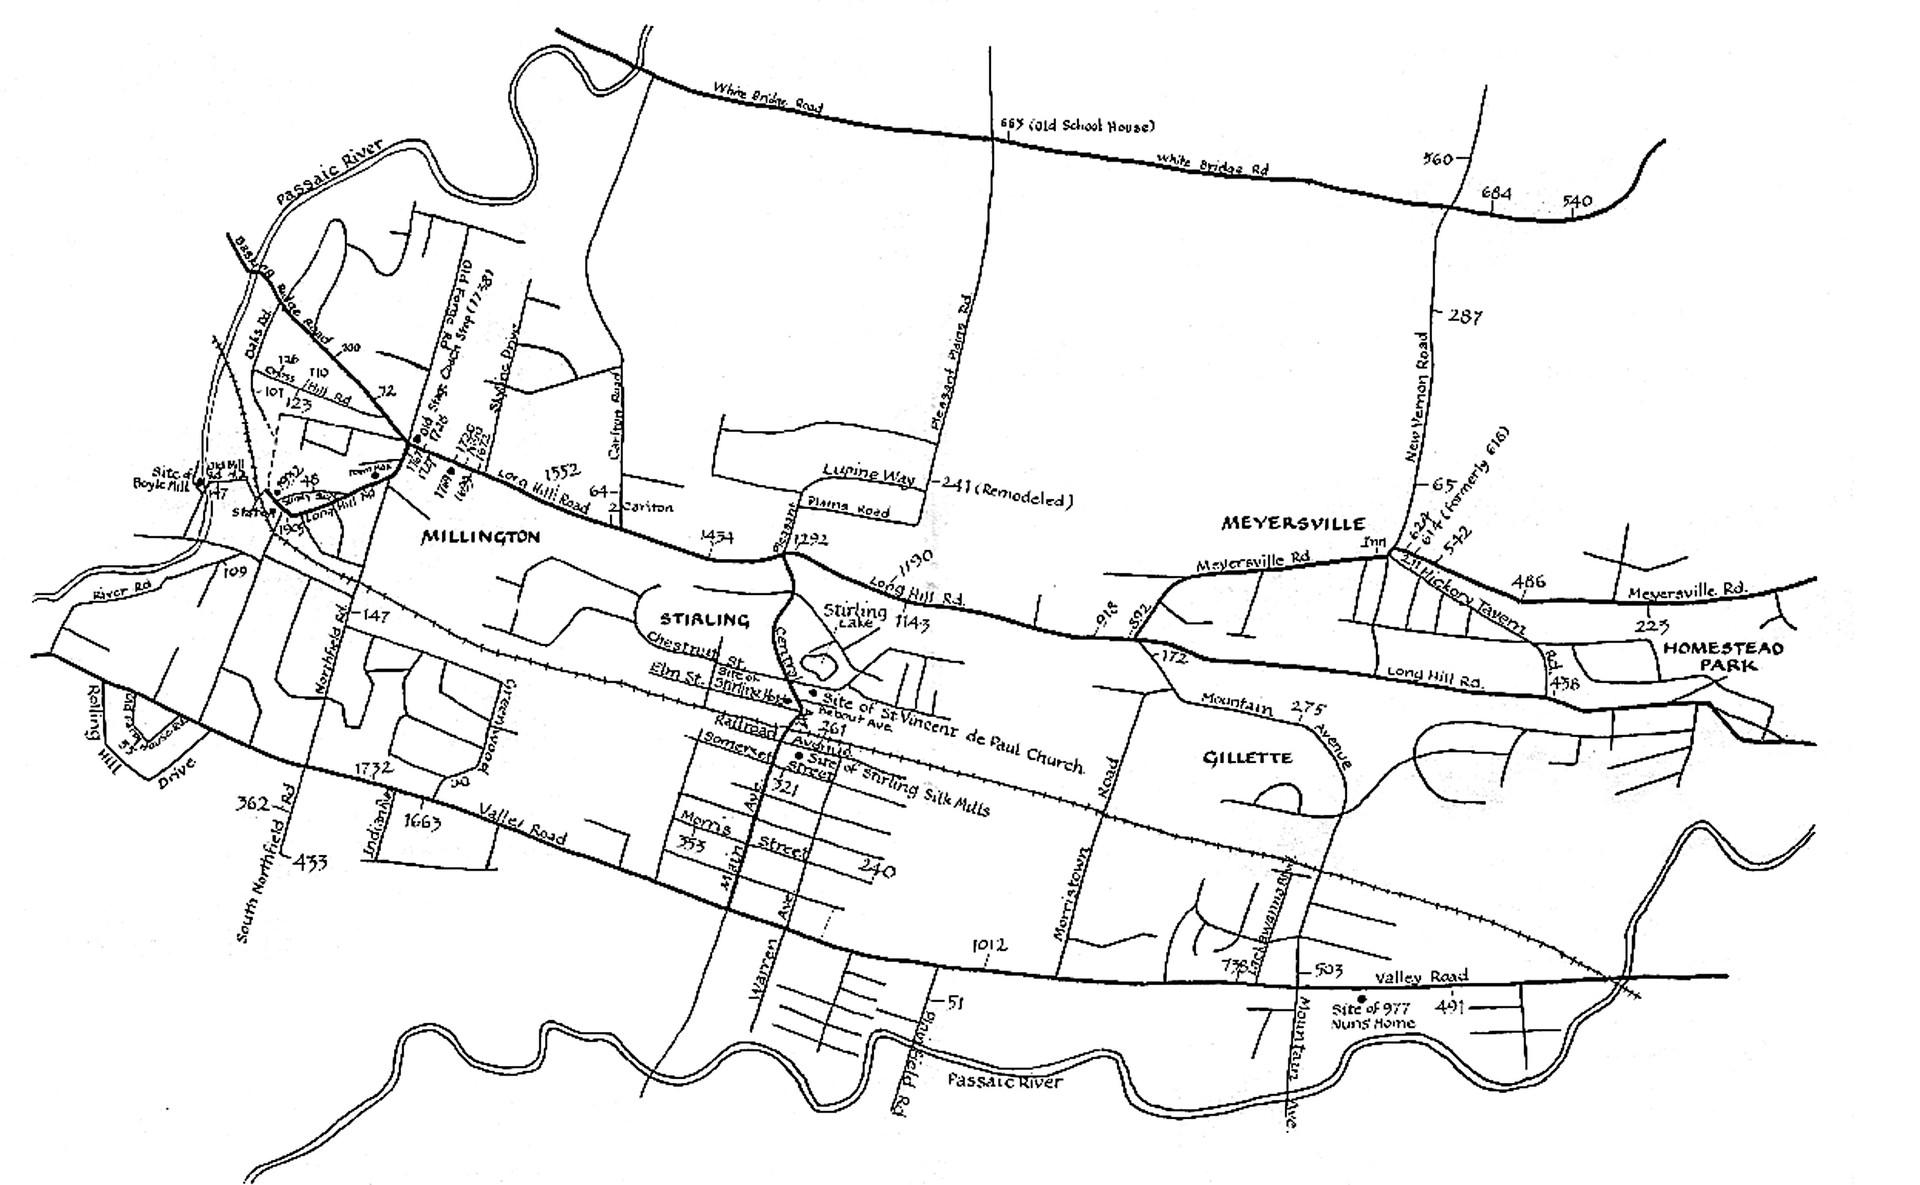 1984 Historic Sites